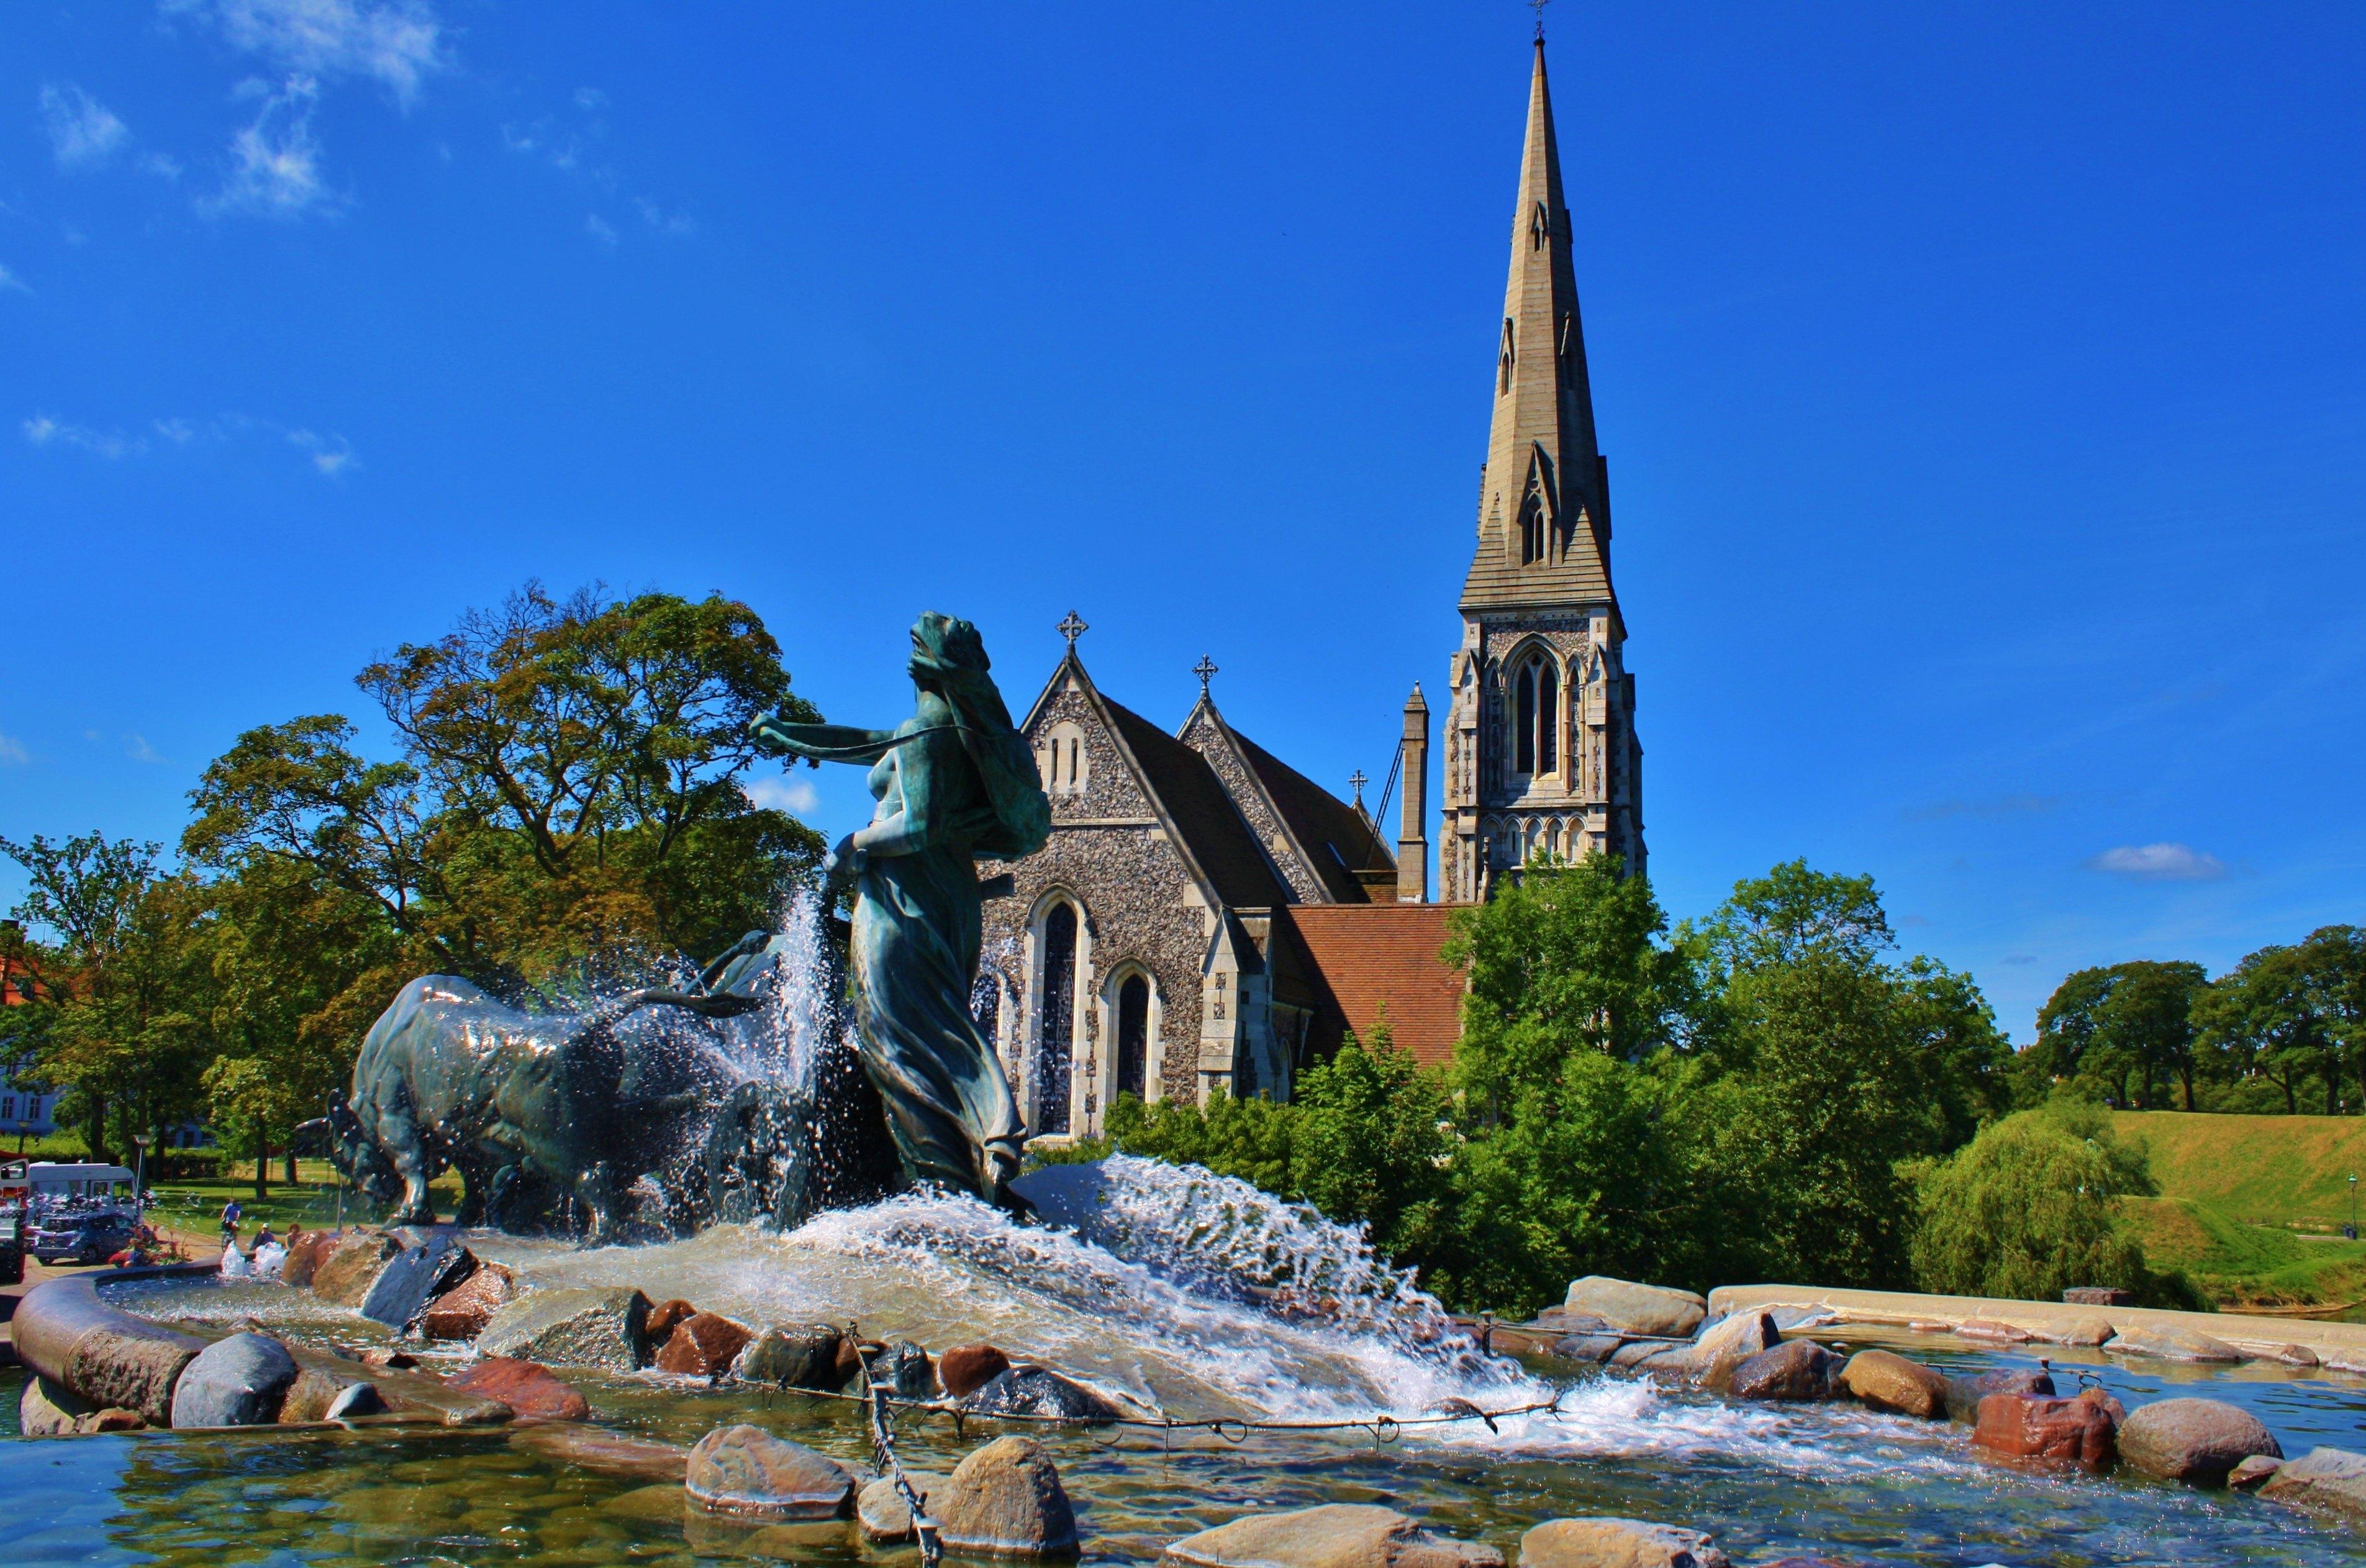 圣阿爾班教堂  St. Alban's Church   -0